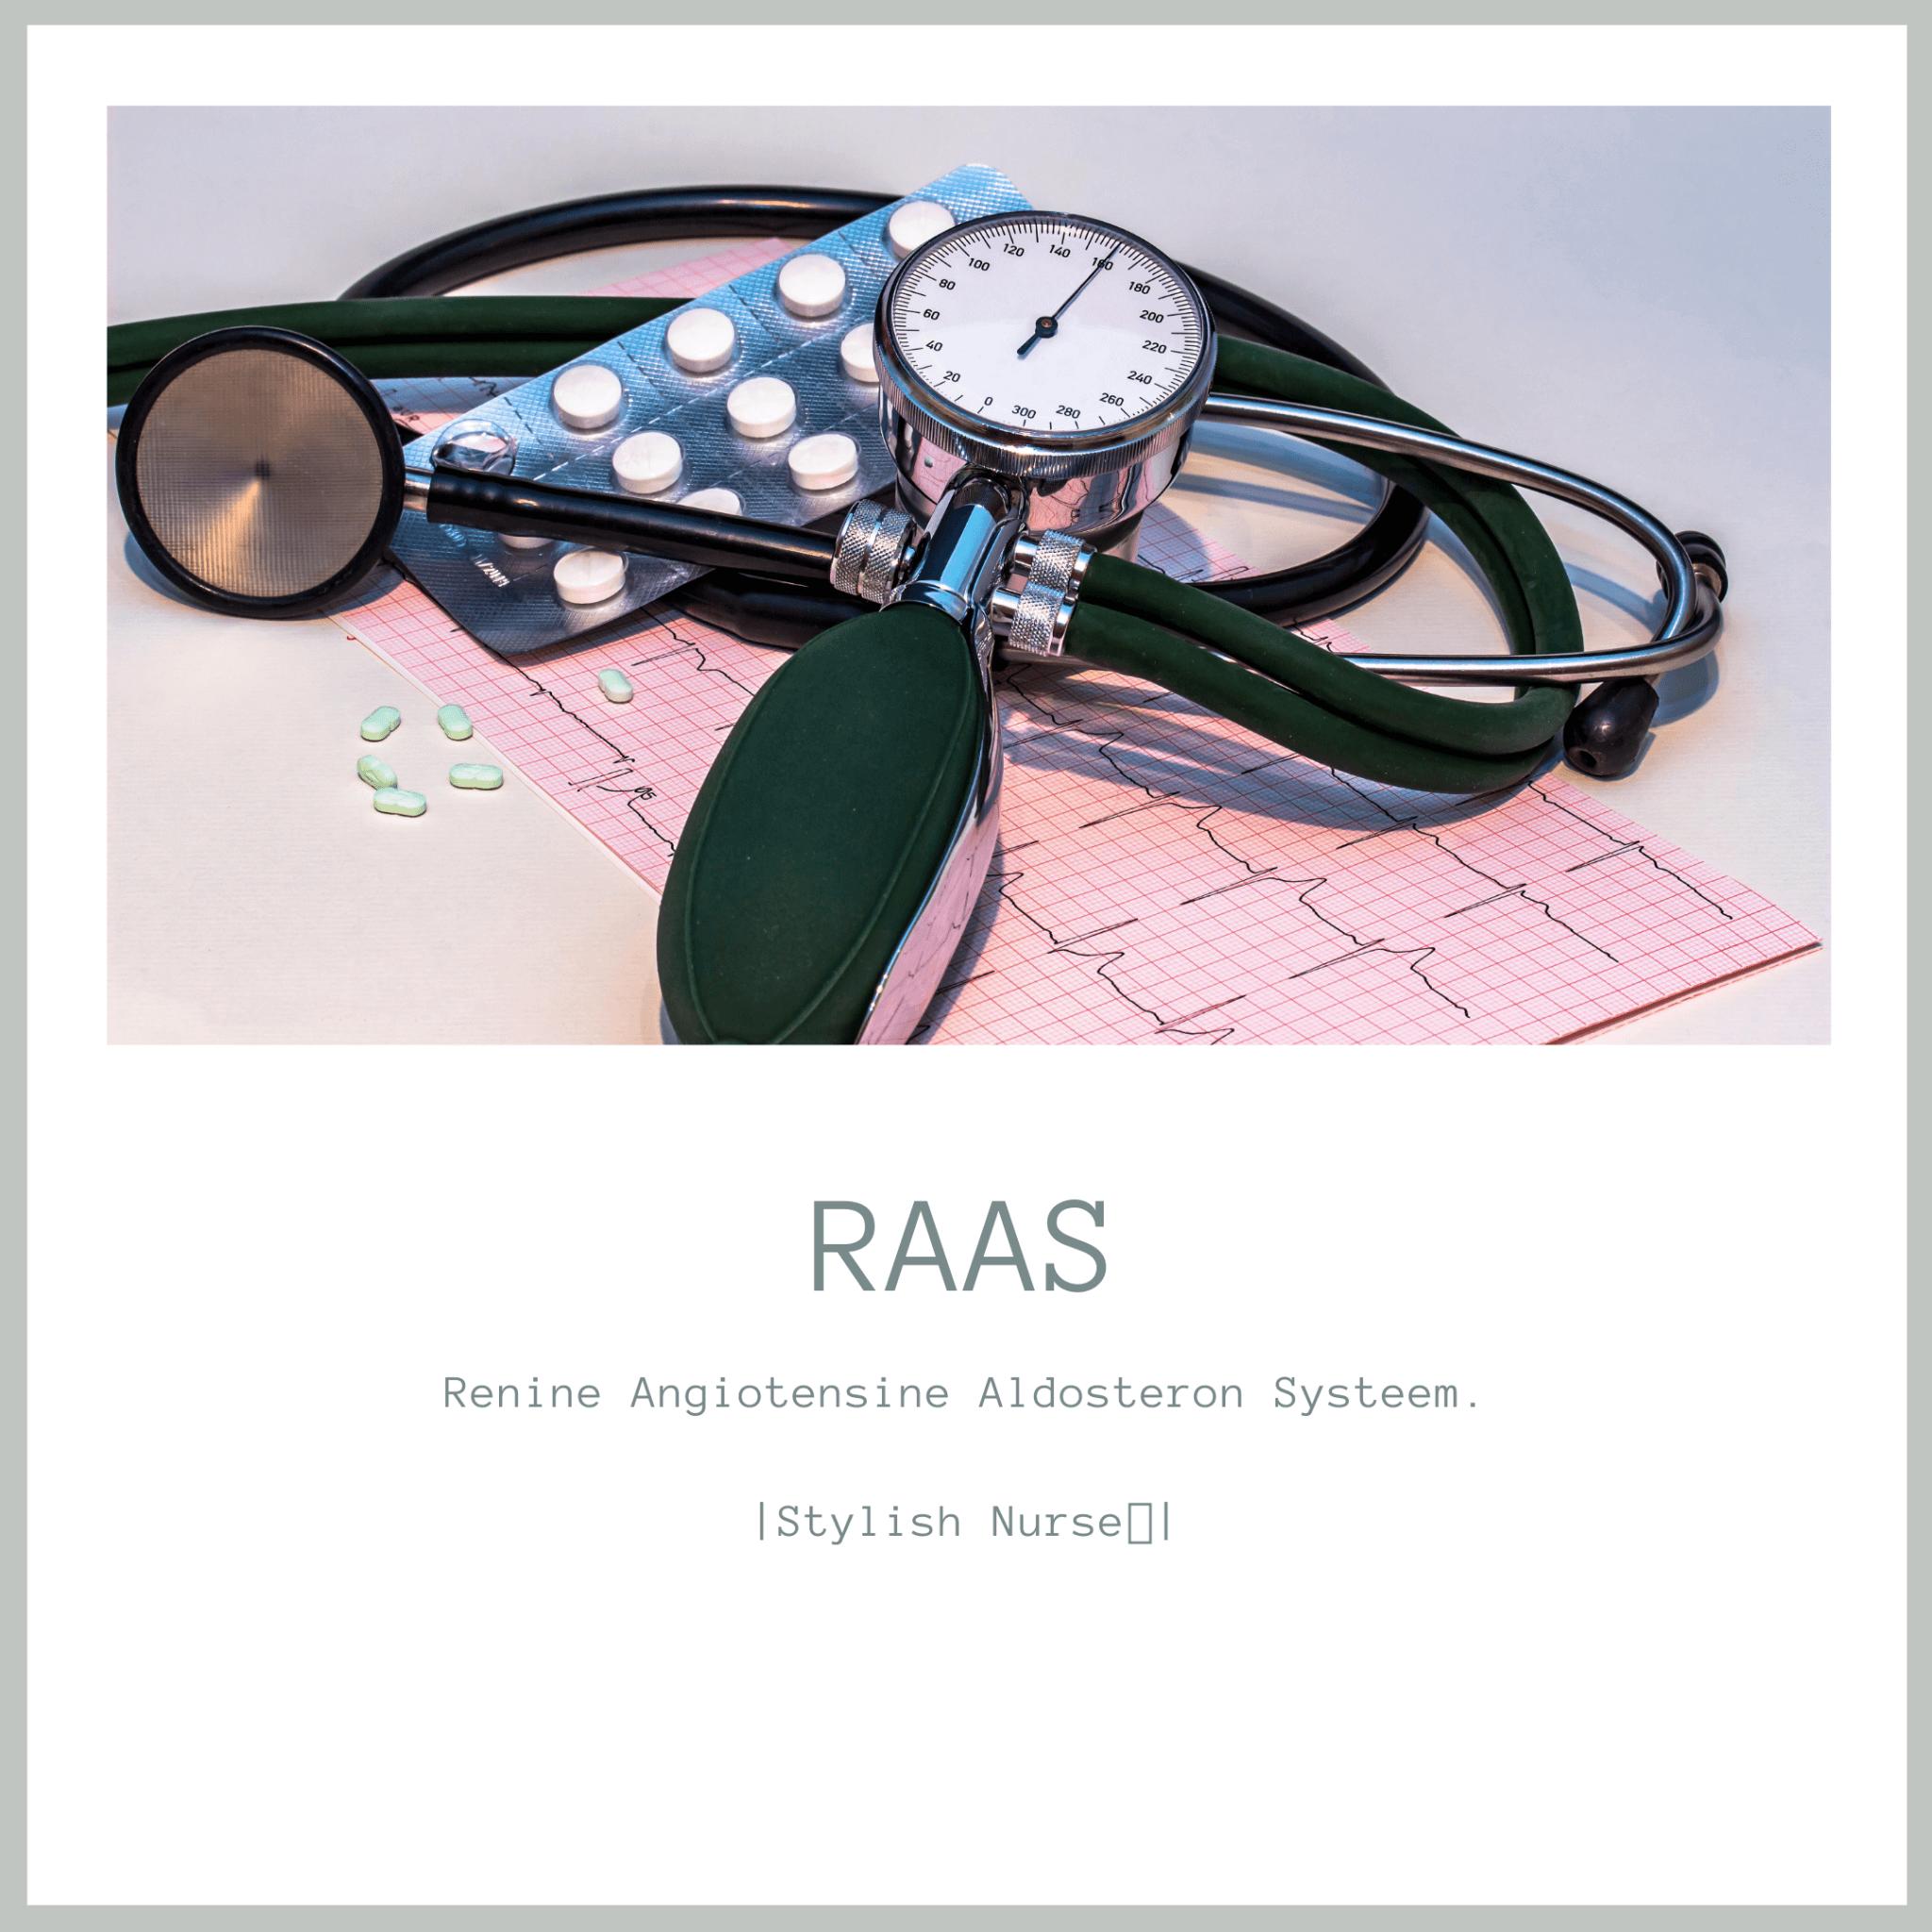 Informatie over Renine Angiotensine Aldosteron Systeem (RAAS)